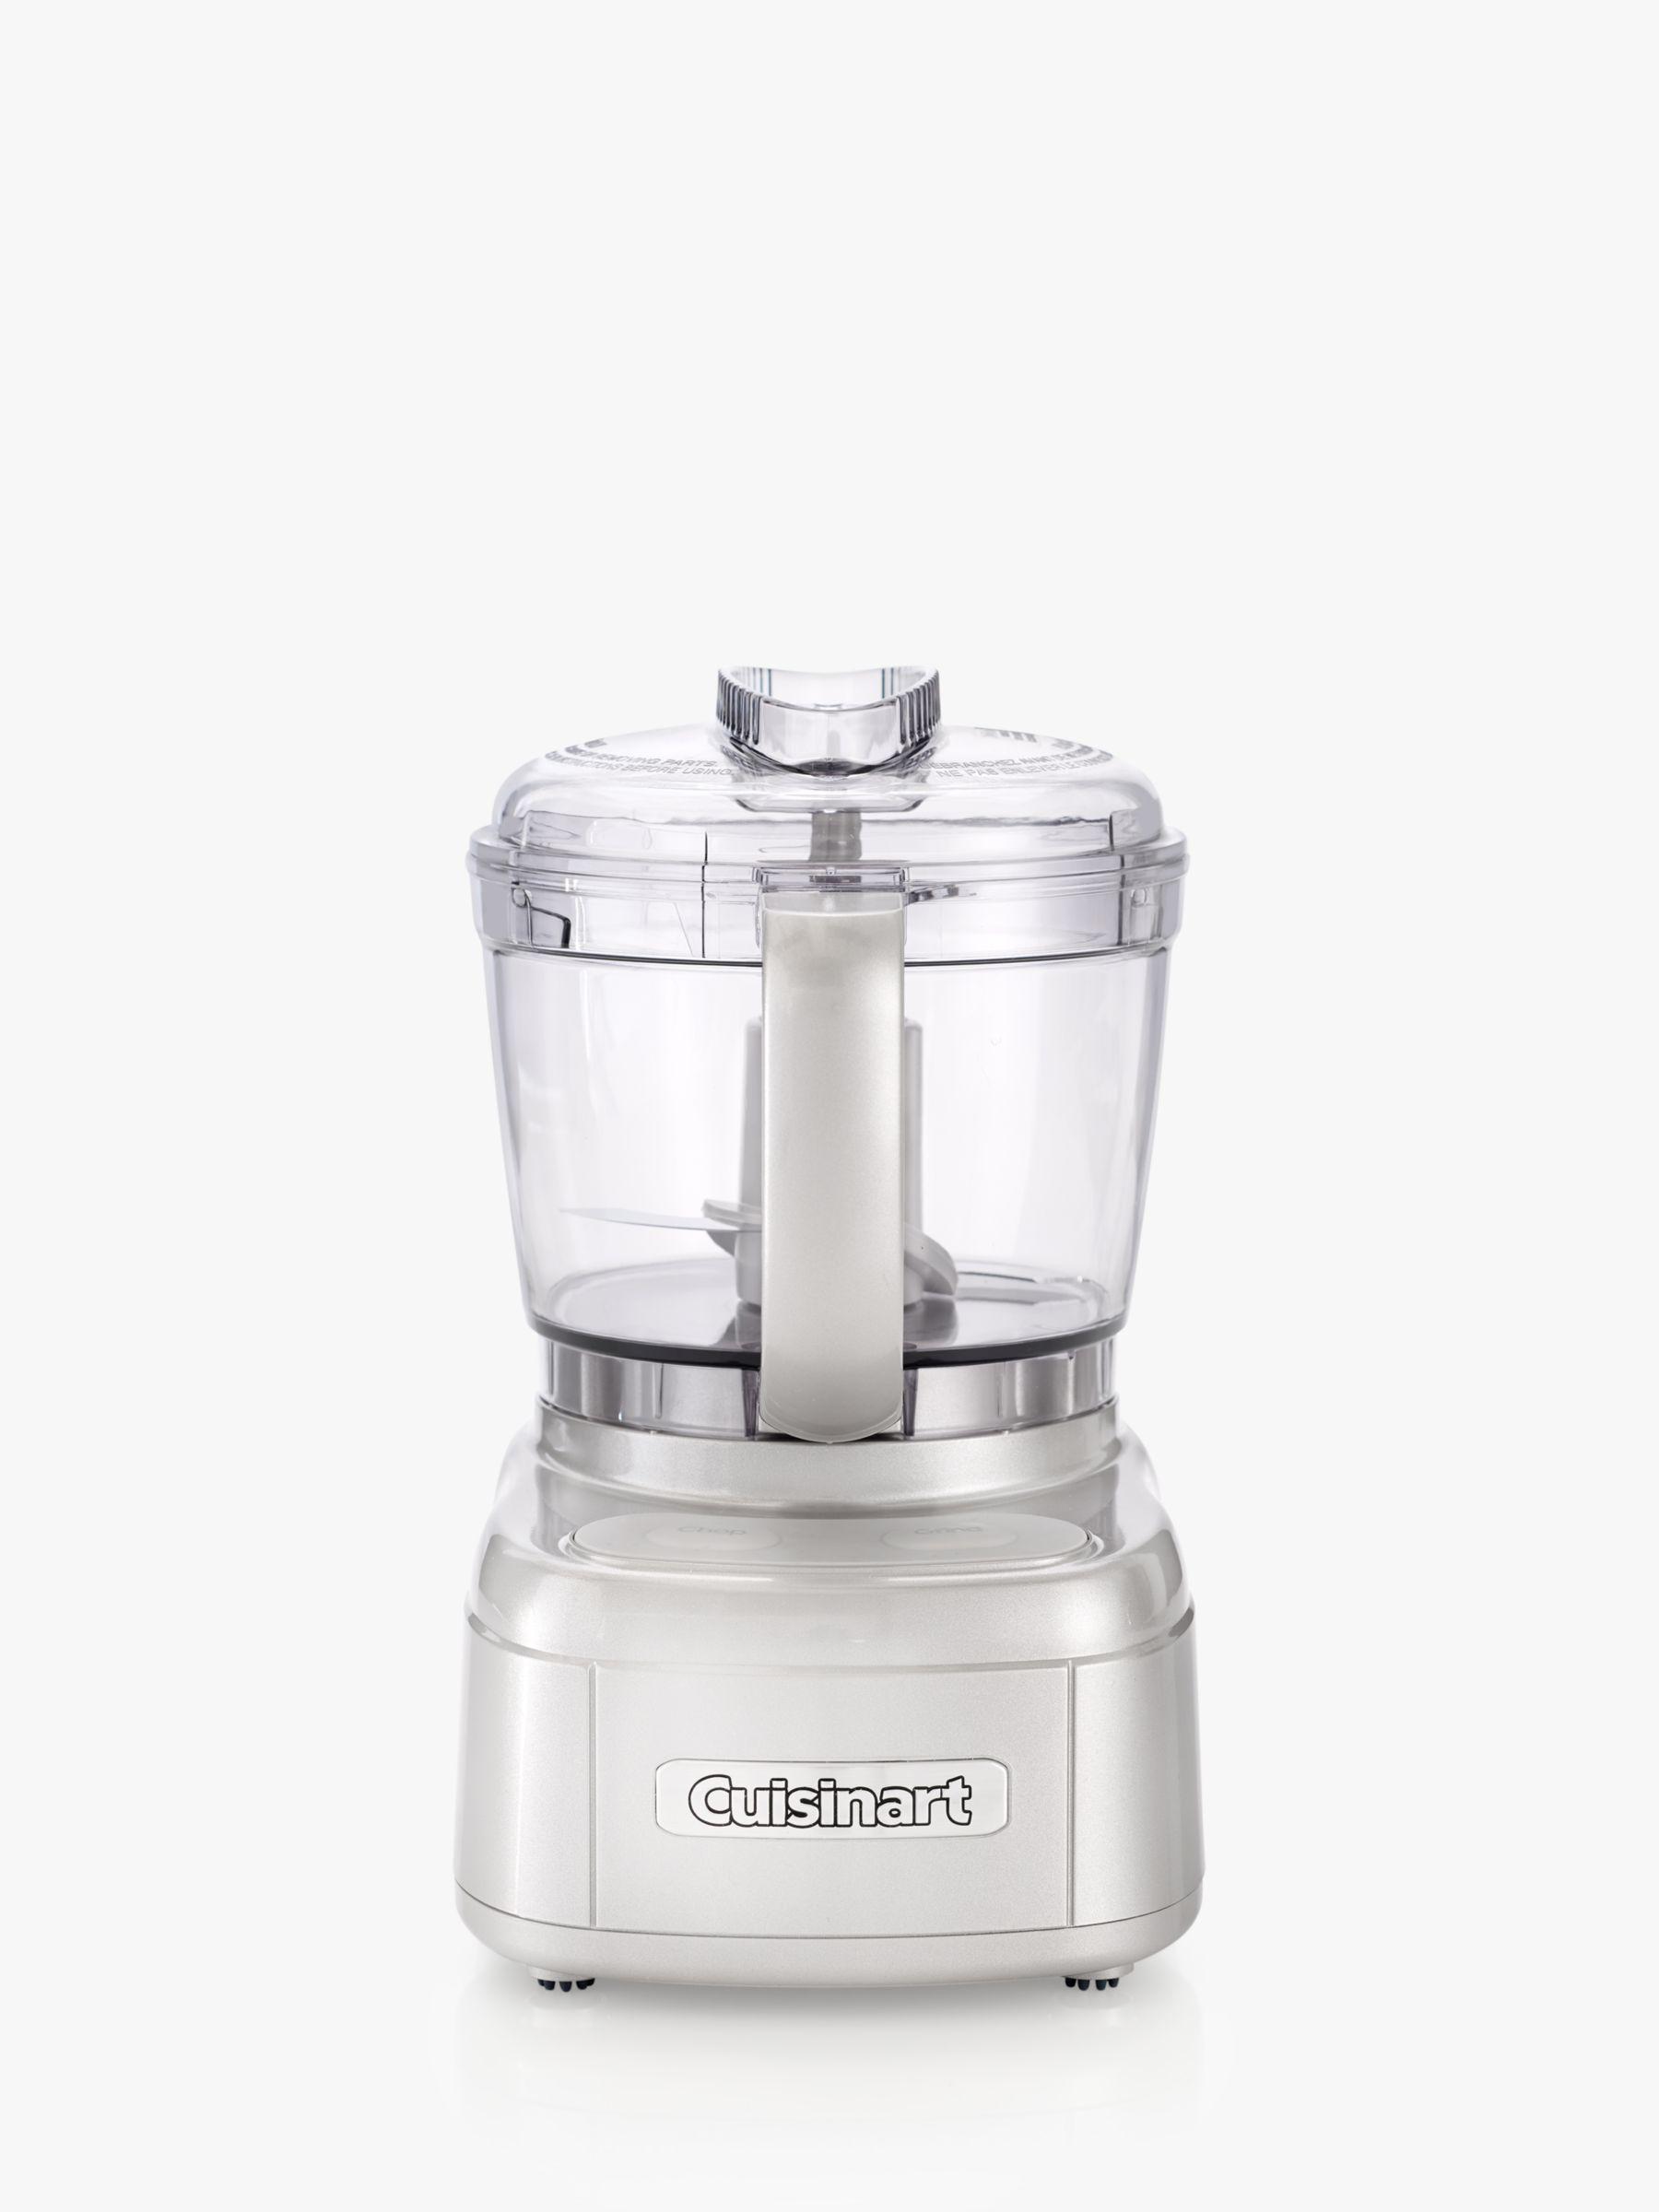 Cuisinart Cuisinart Mini Prep Pro Food Processor